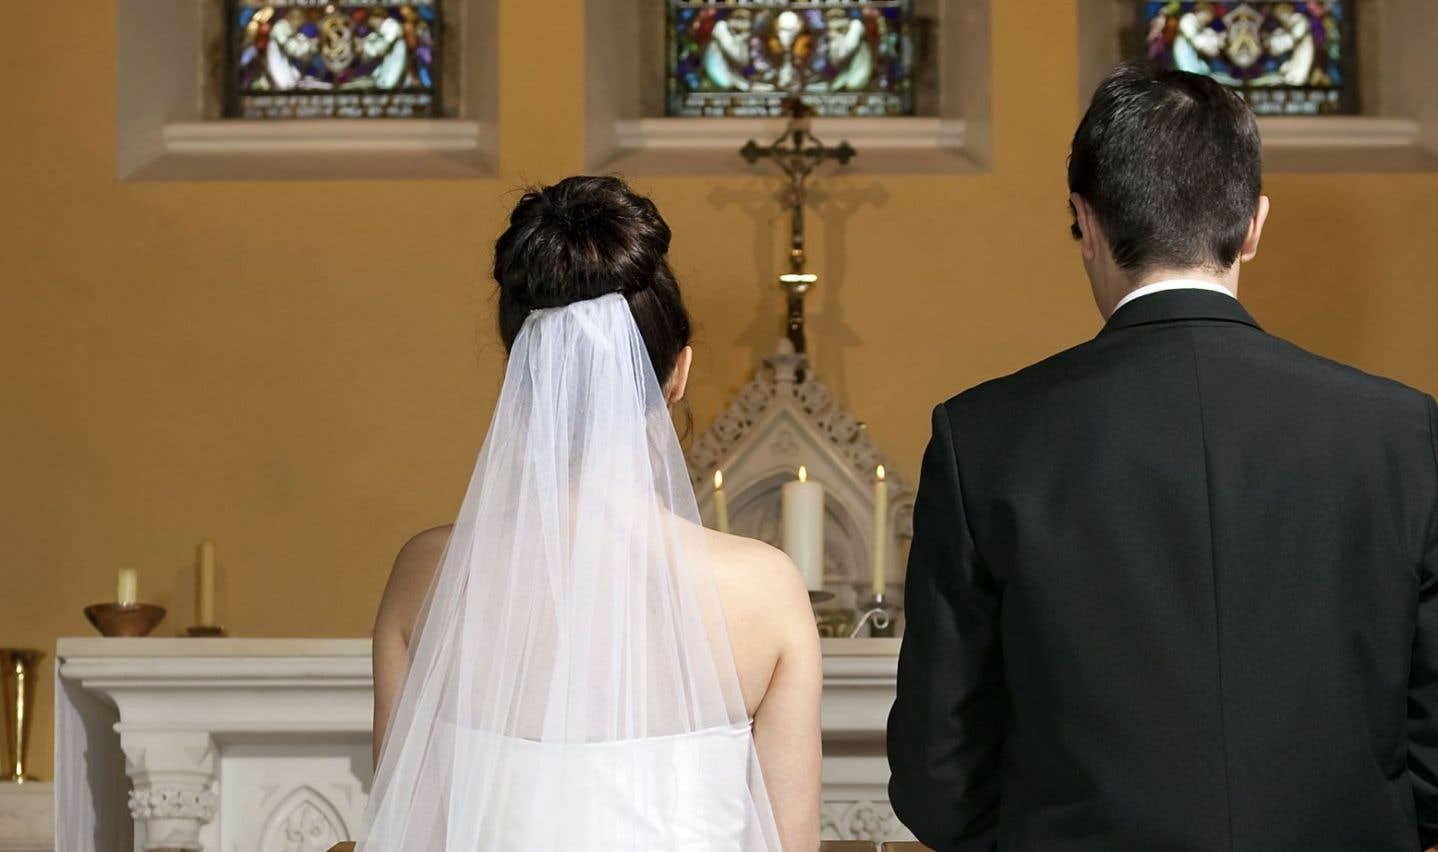 mariage union spirituelle. Black Bedroom Furniture Sets. Home Design Ideas